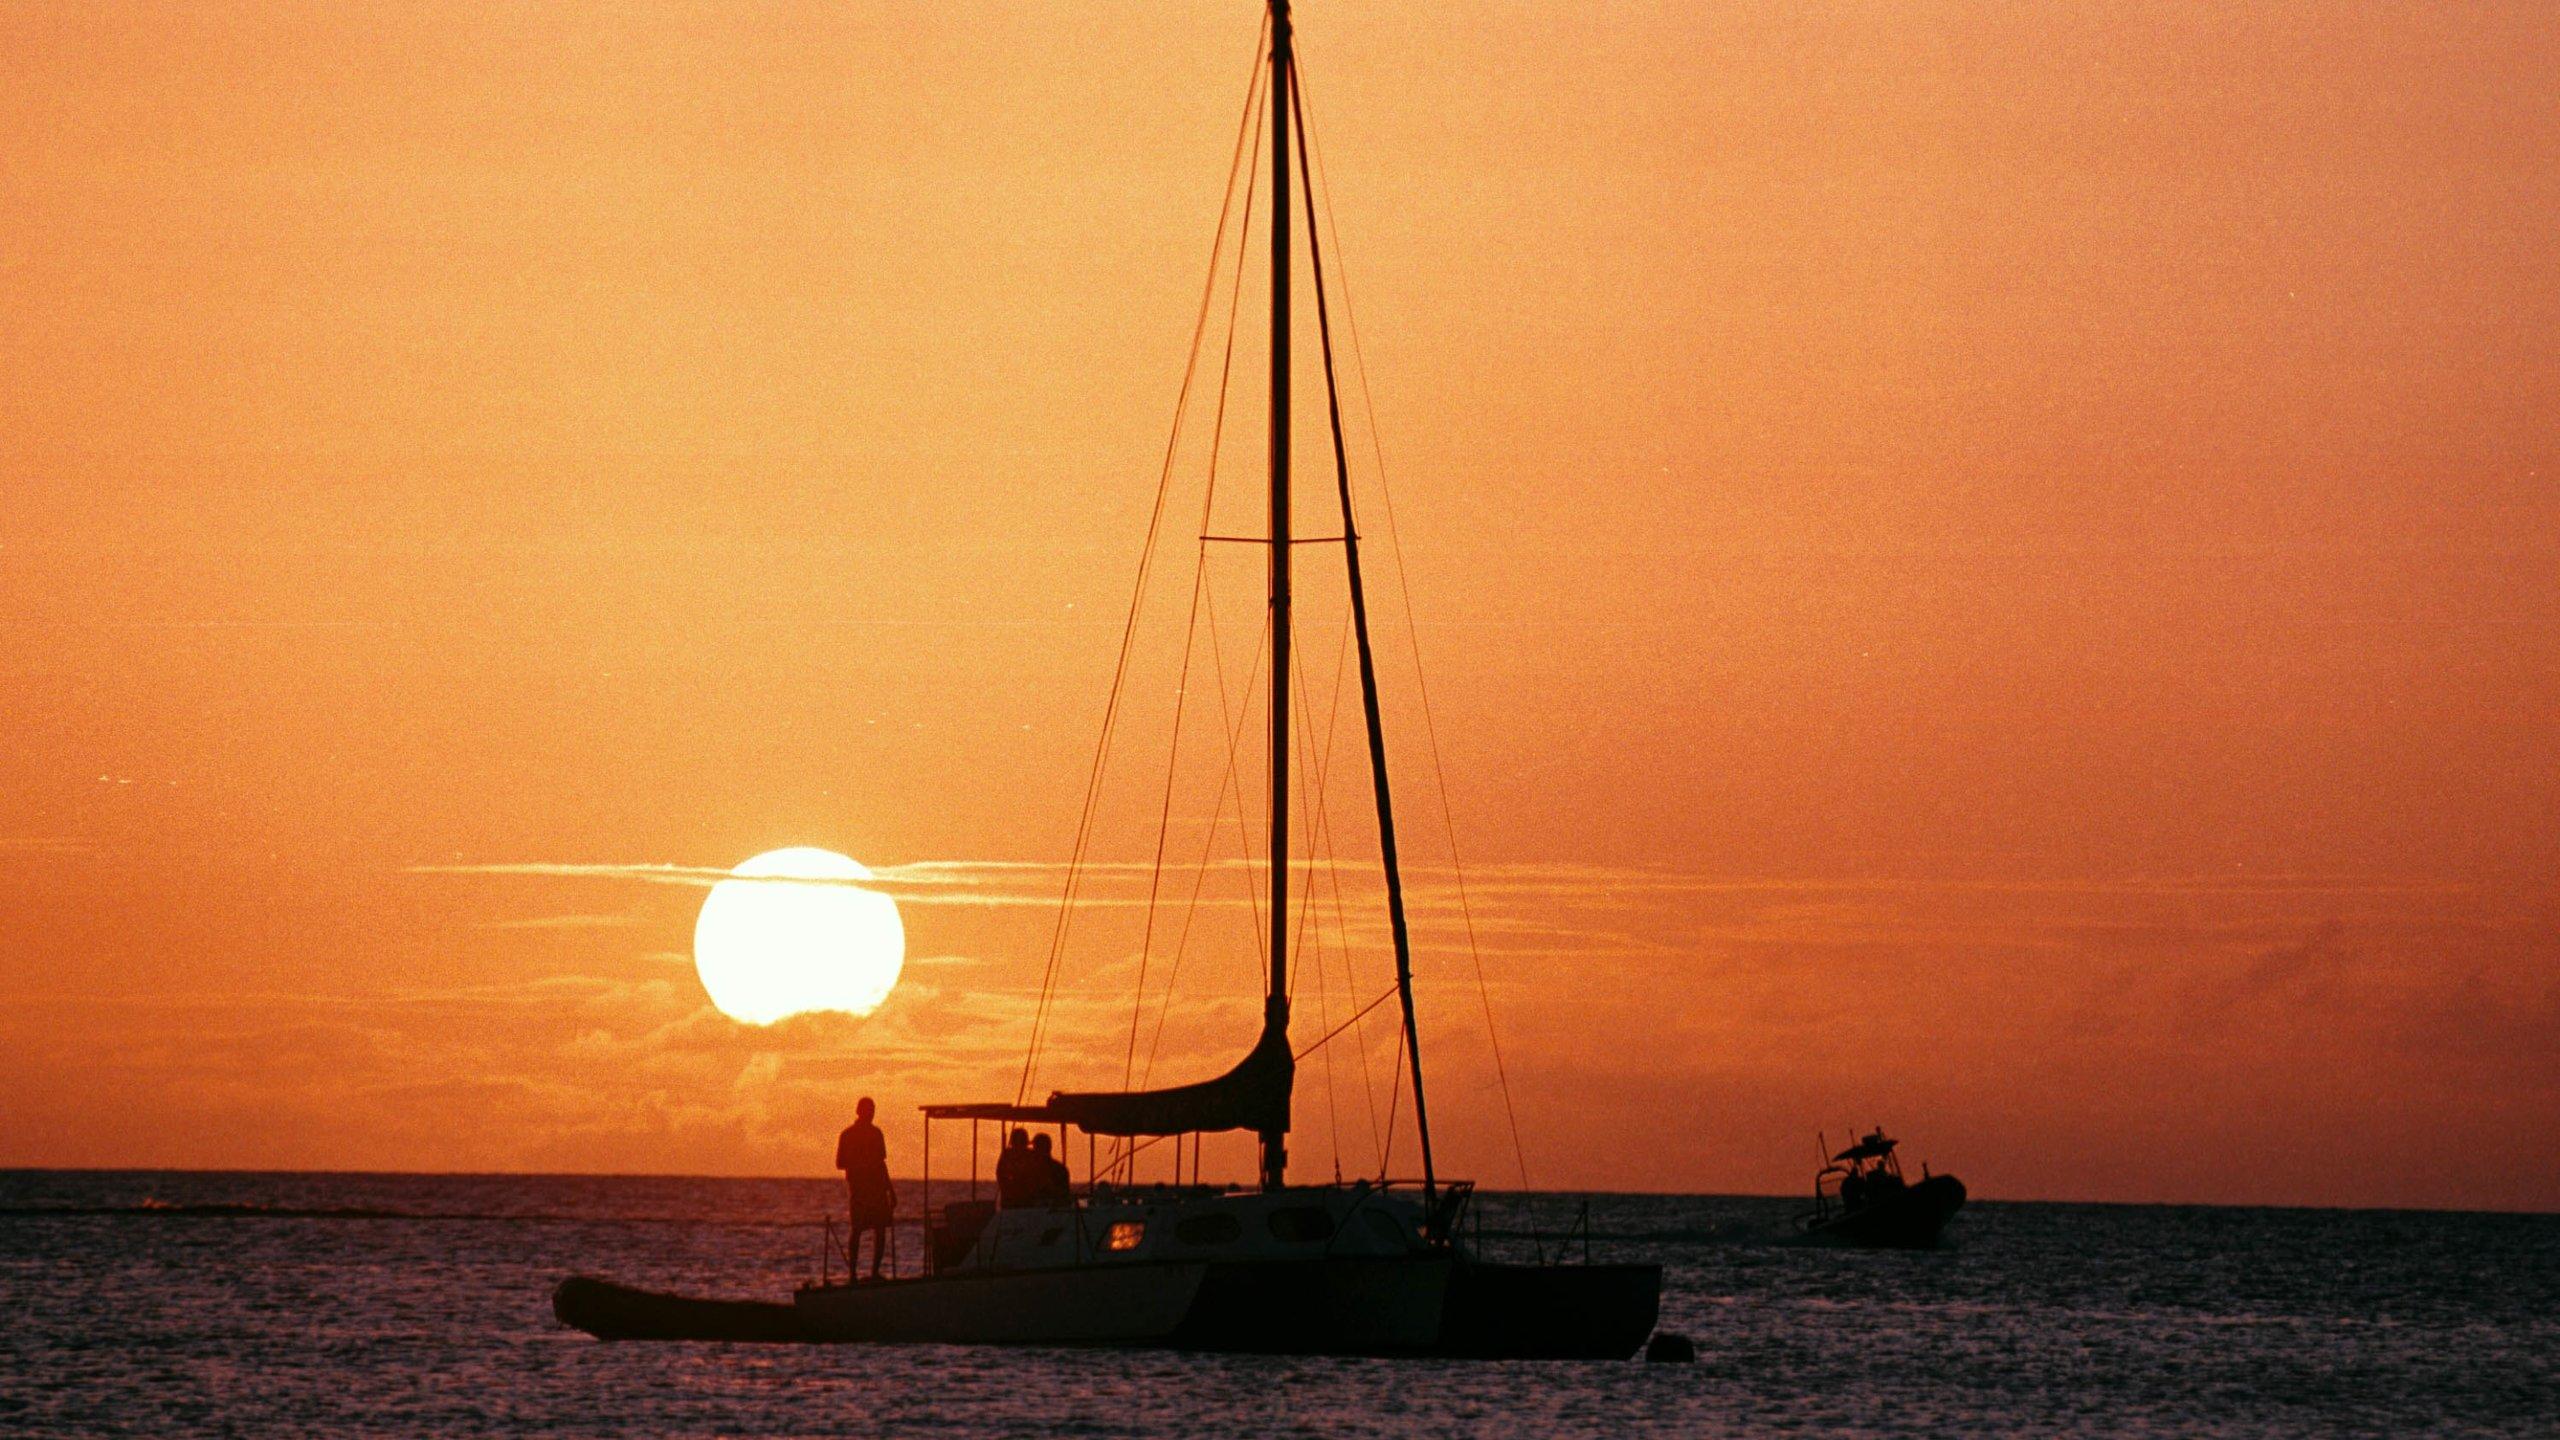 St. Joseph, Barbados